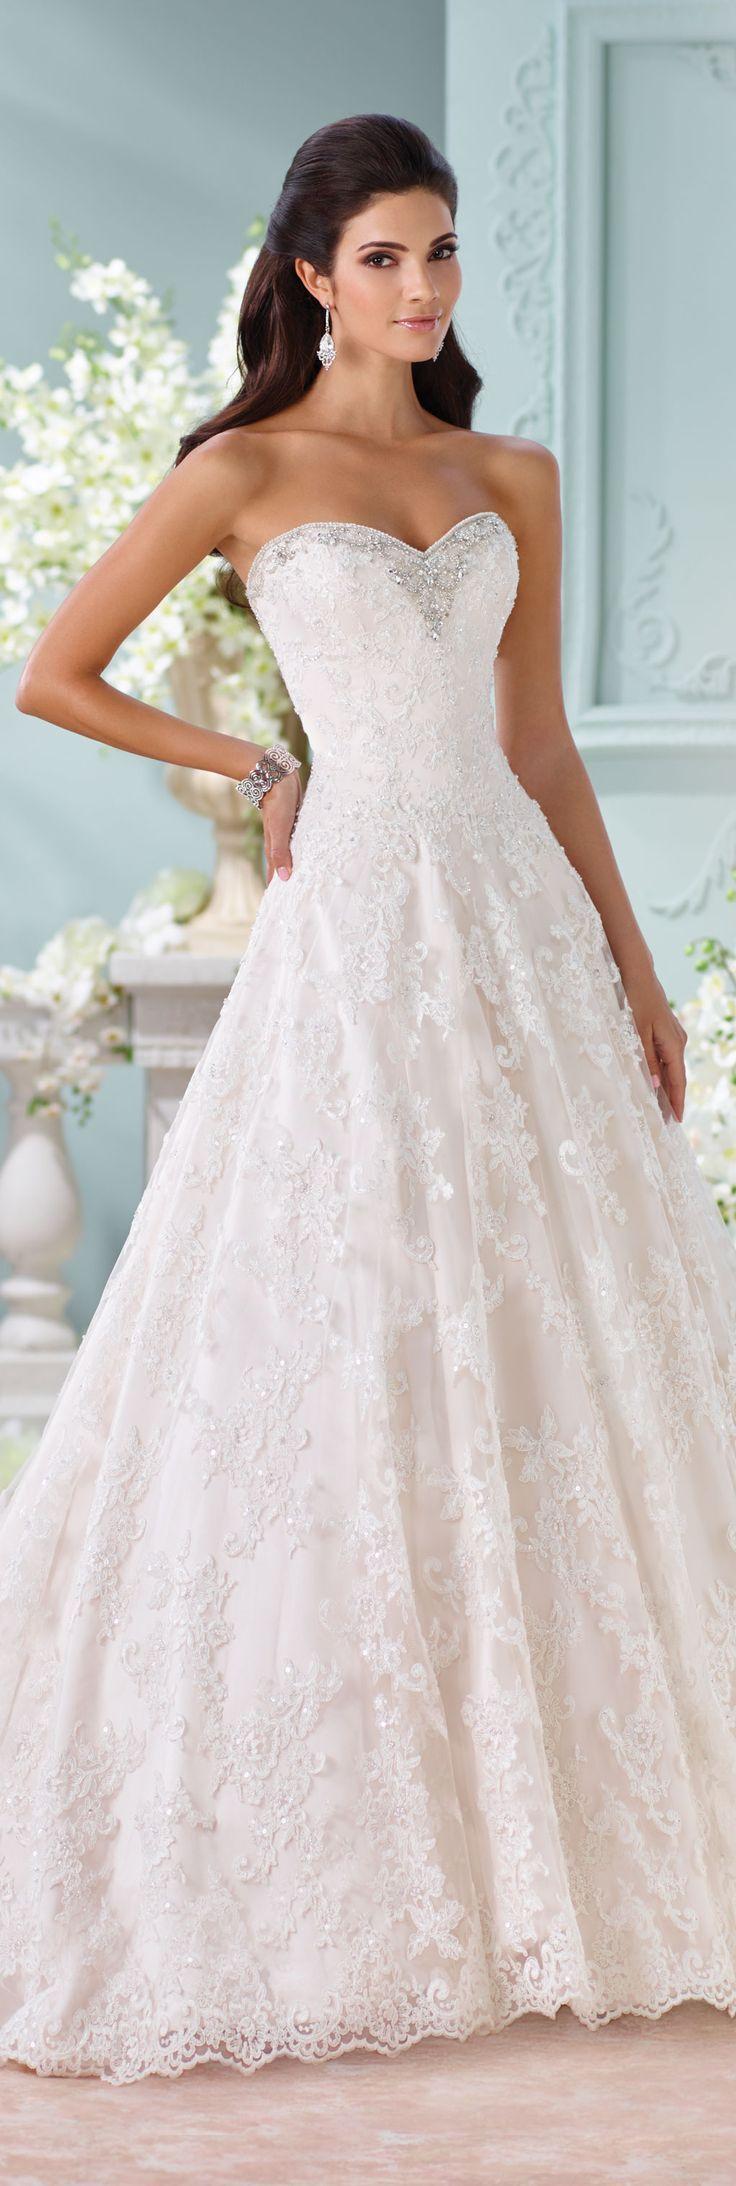 Best 20+ 2016 wedding dresses ideas on Pinterest   Wedding ...